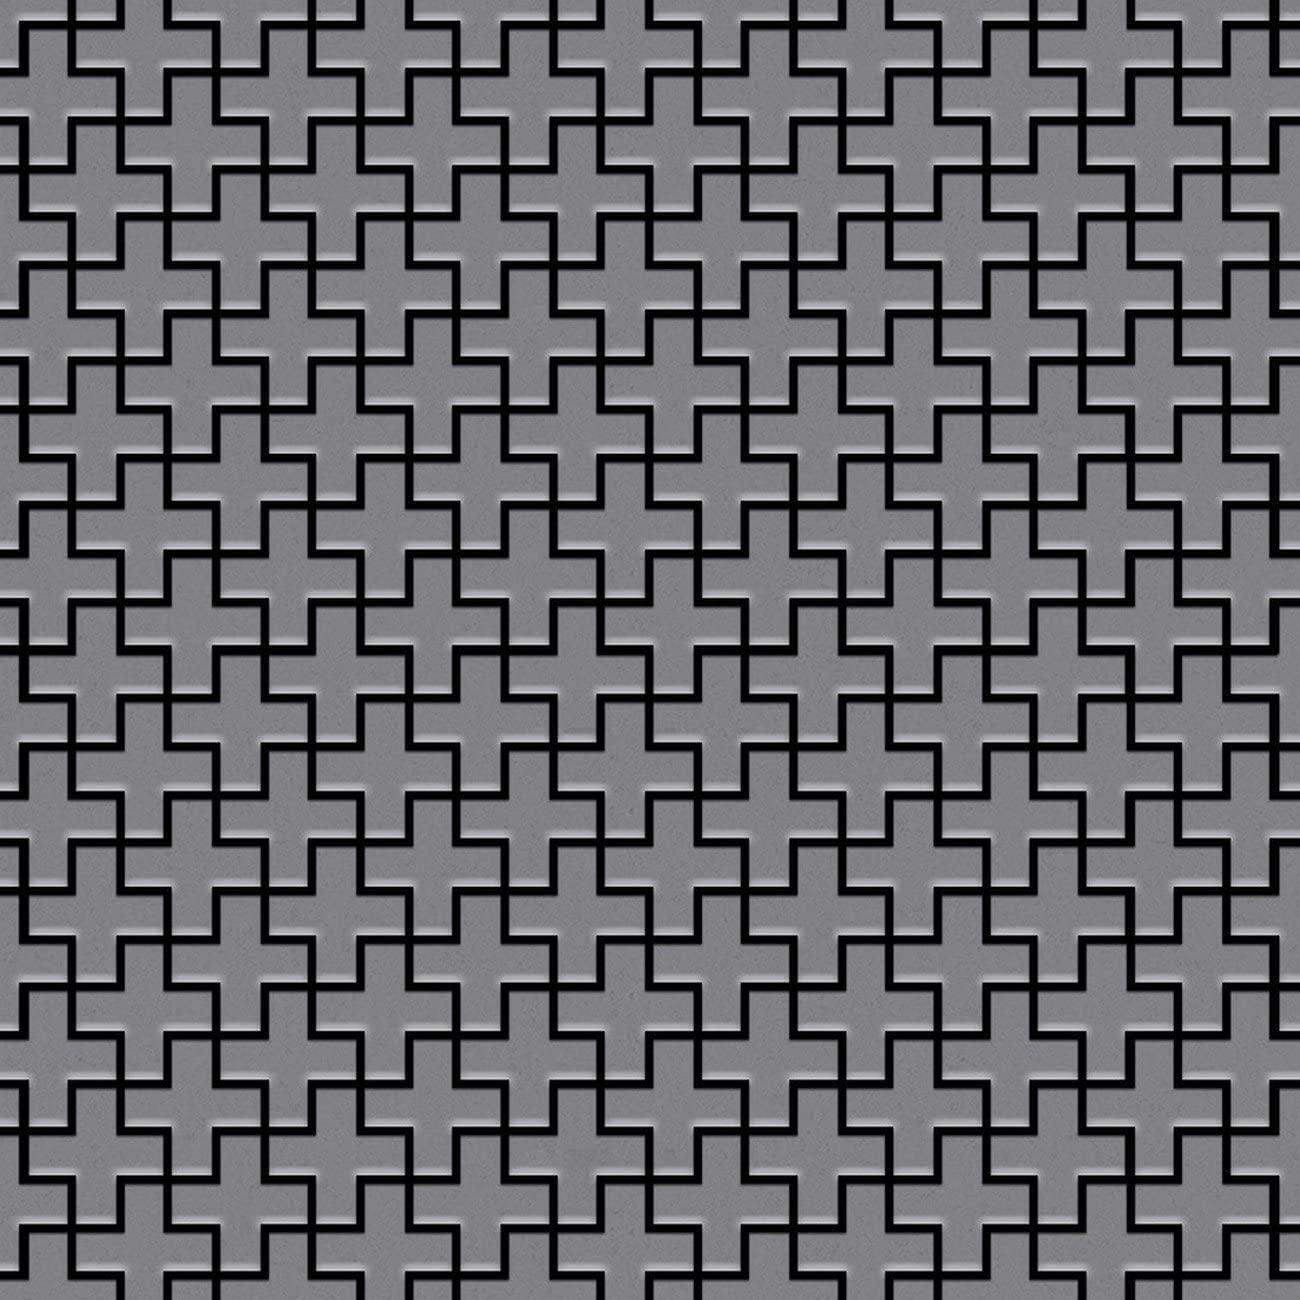 Mosaic Tile massiv Metal Stainless Steel matt Grey 1.6mm Thick ALLOY Swiss Cross-S-S-MA